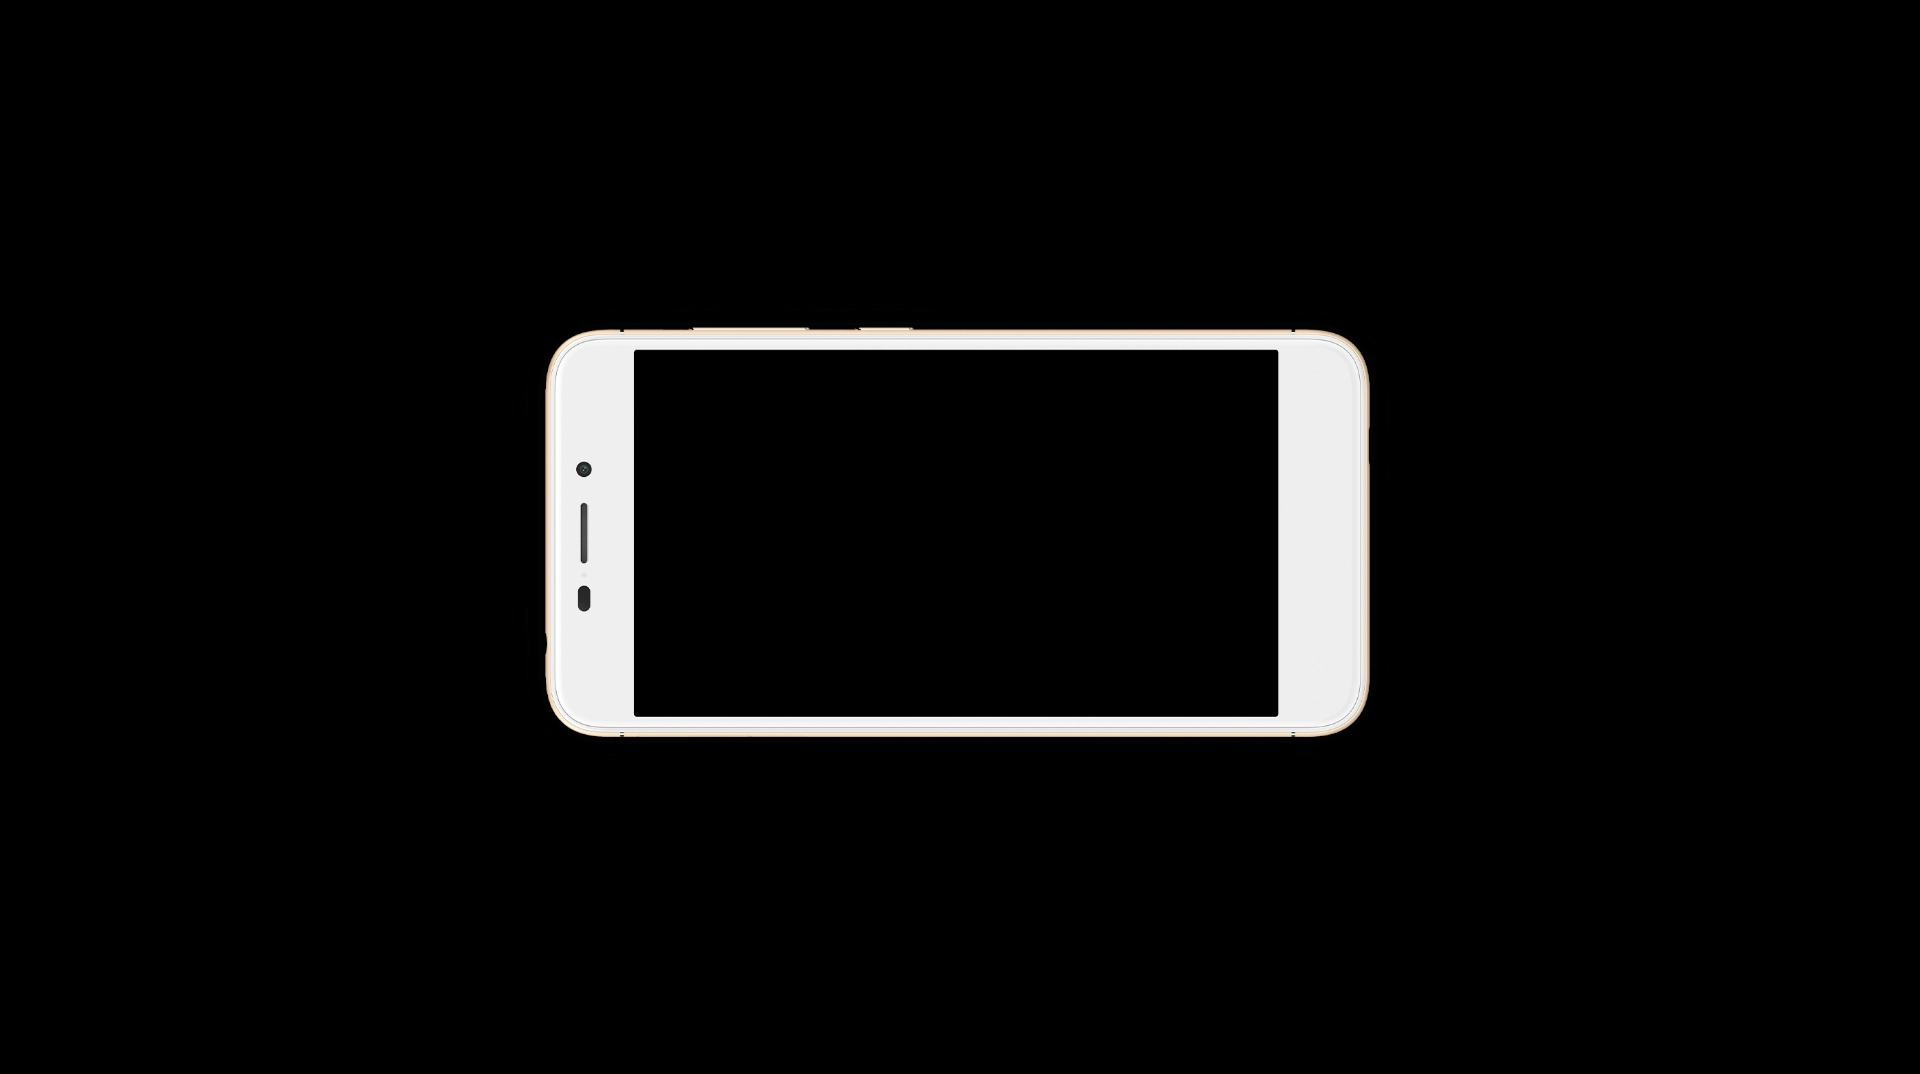 panasonic eluga i5 smartphone